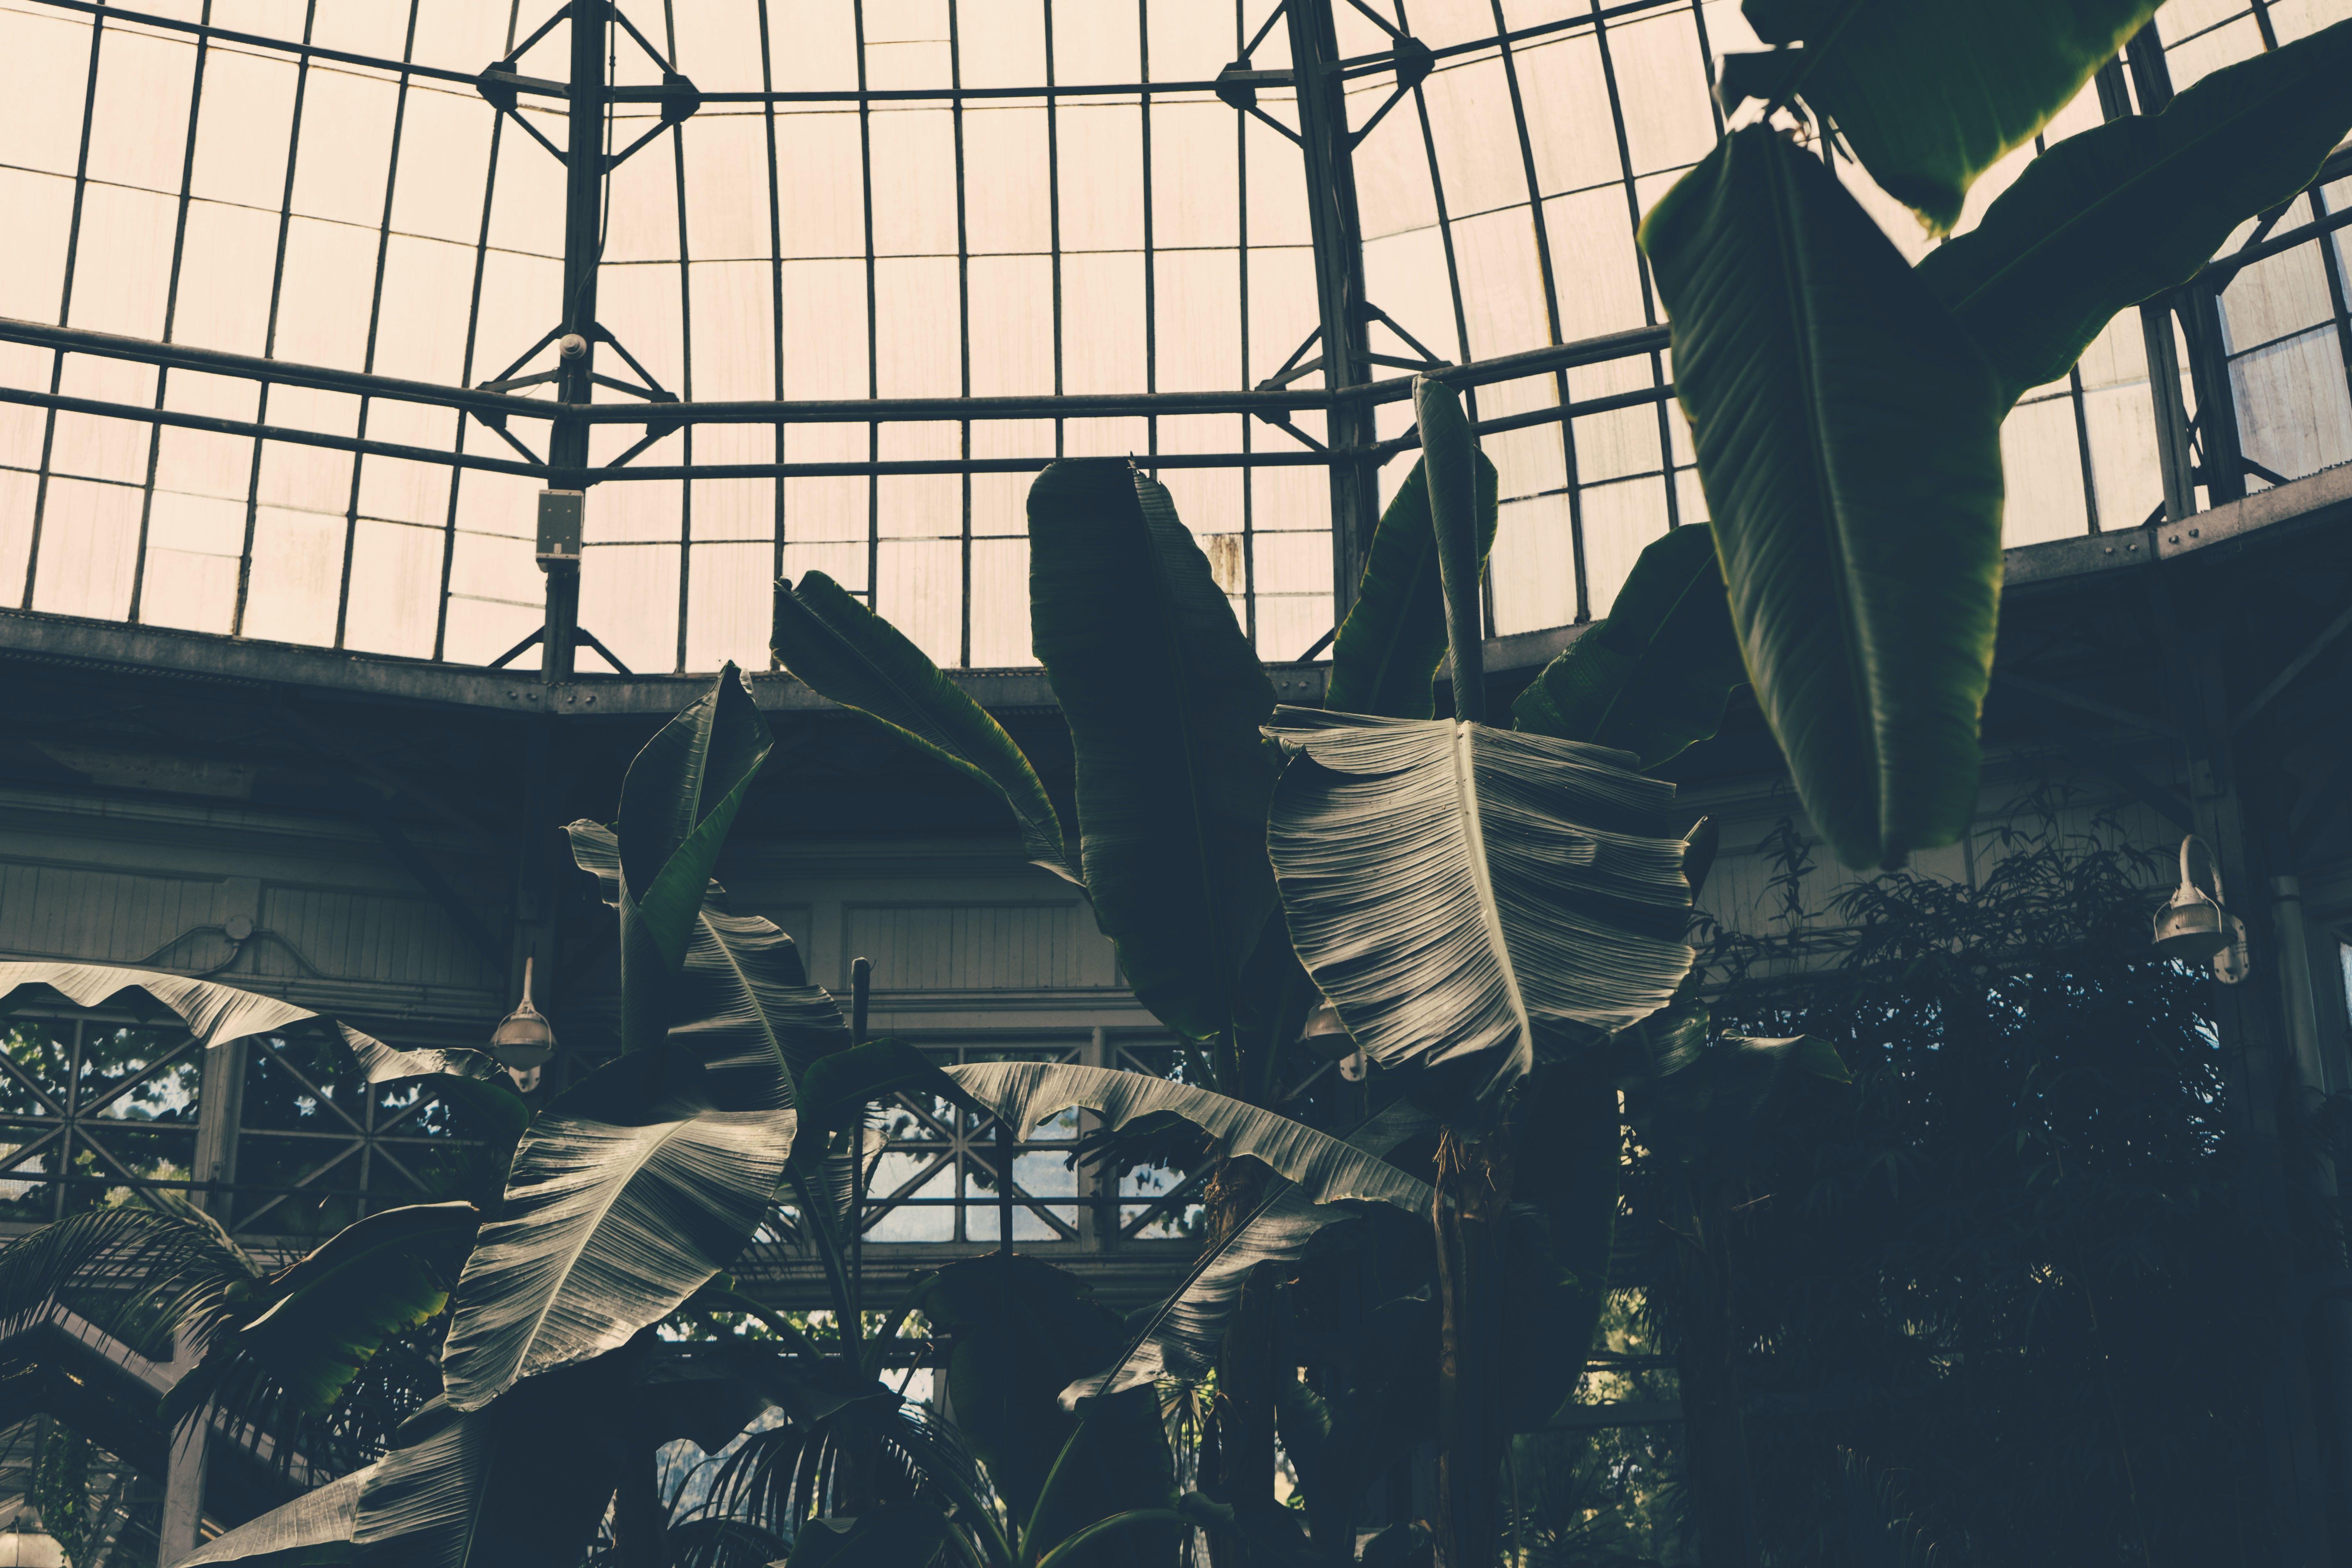 Greyscale Photography of Banana Trees Inside Green House